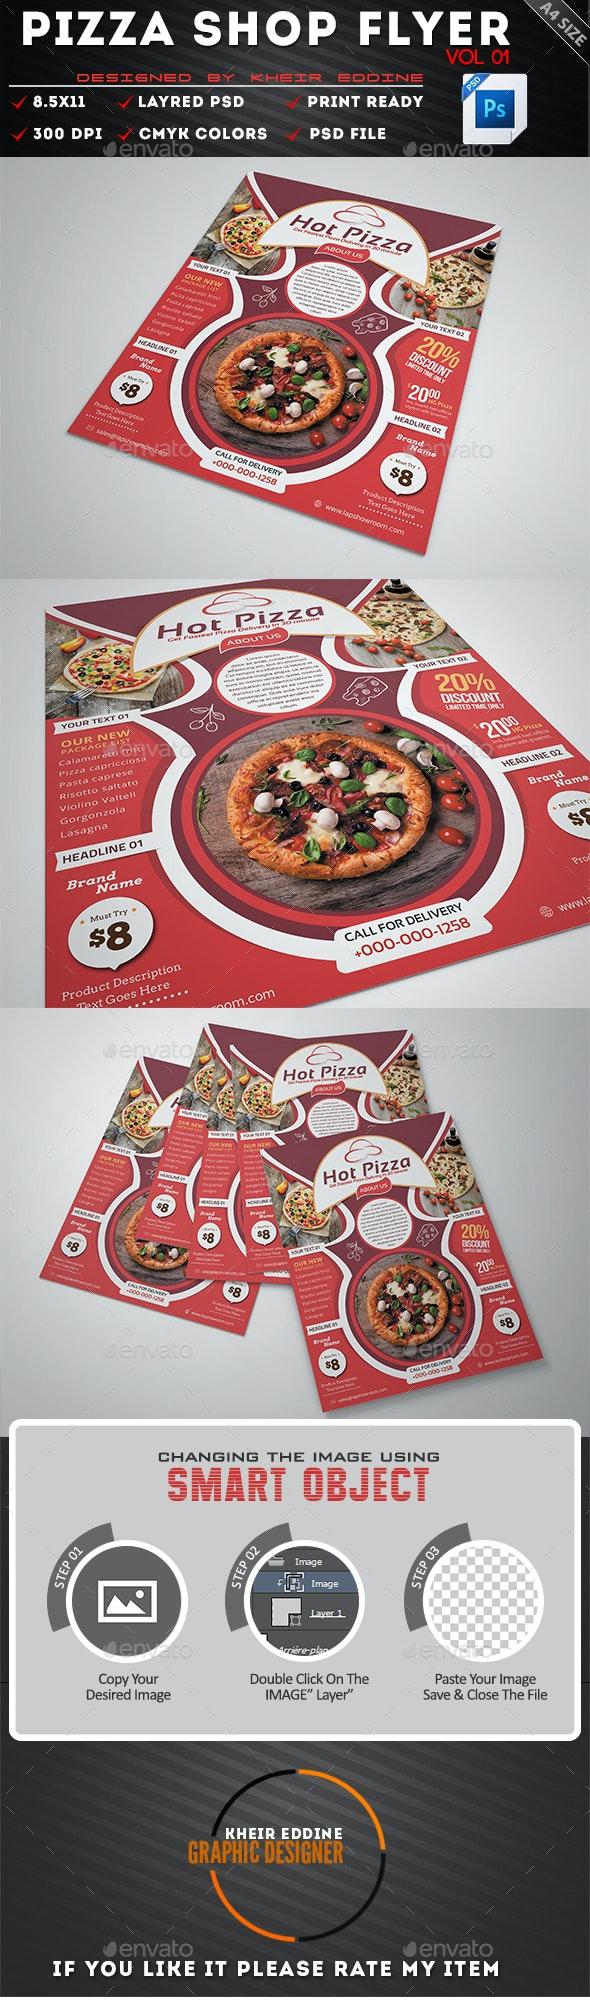 Pizza Shop Flyer Vol 01 - Flyers Print Templates